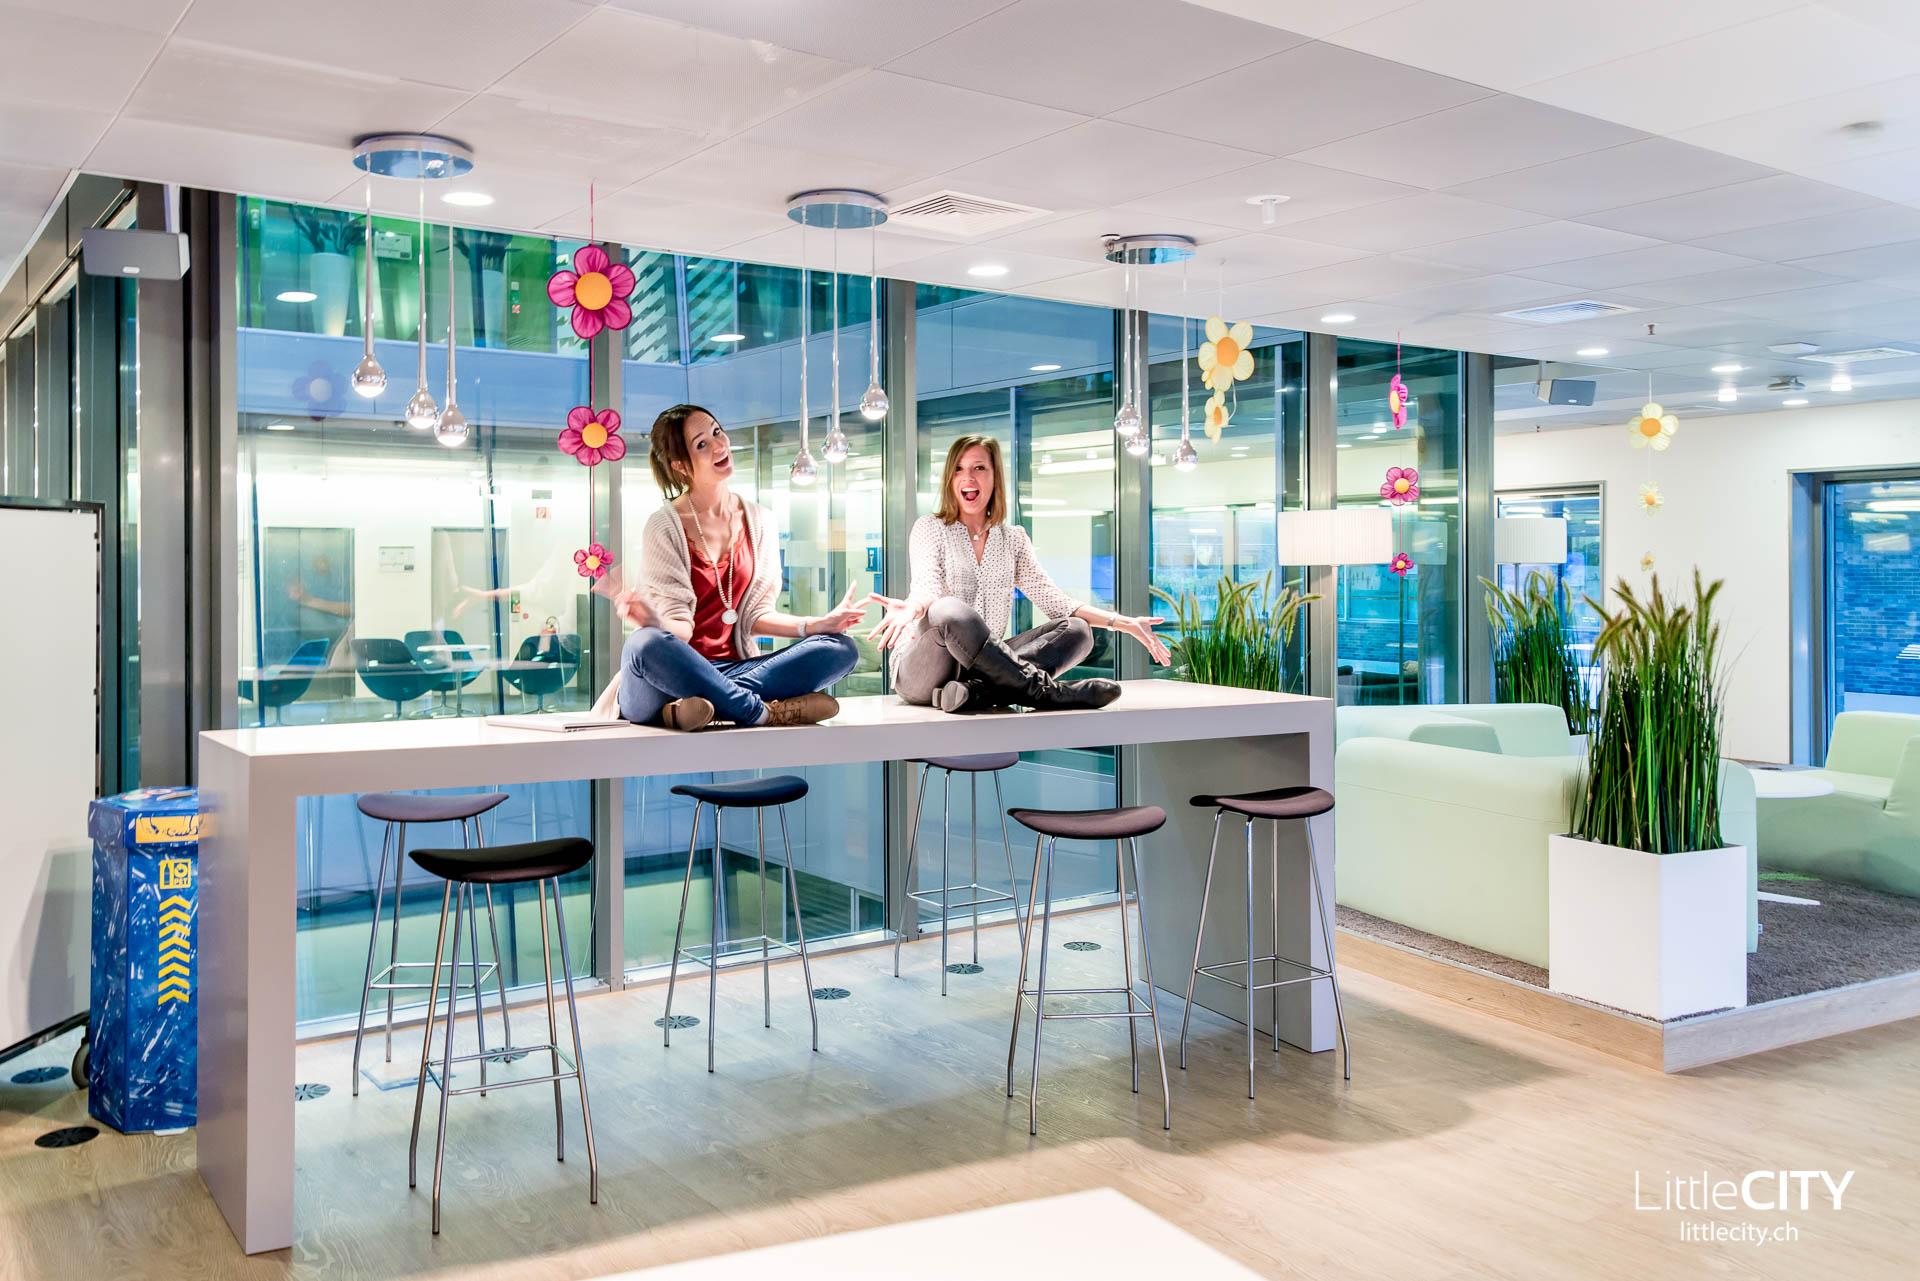 Microsoft Schweiz Büros LittleCITY-21